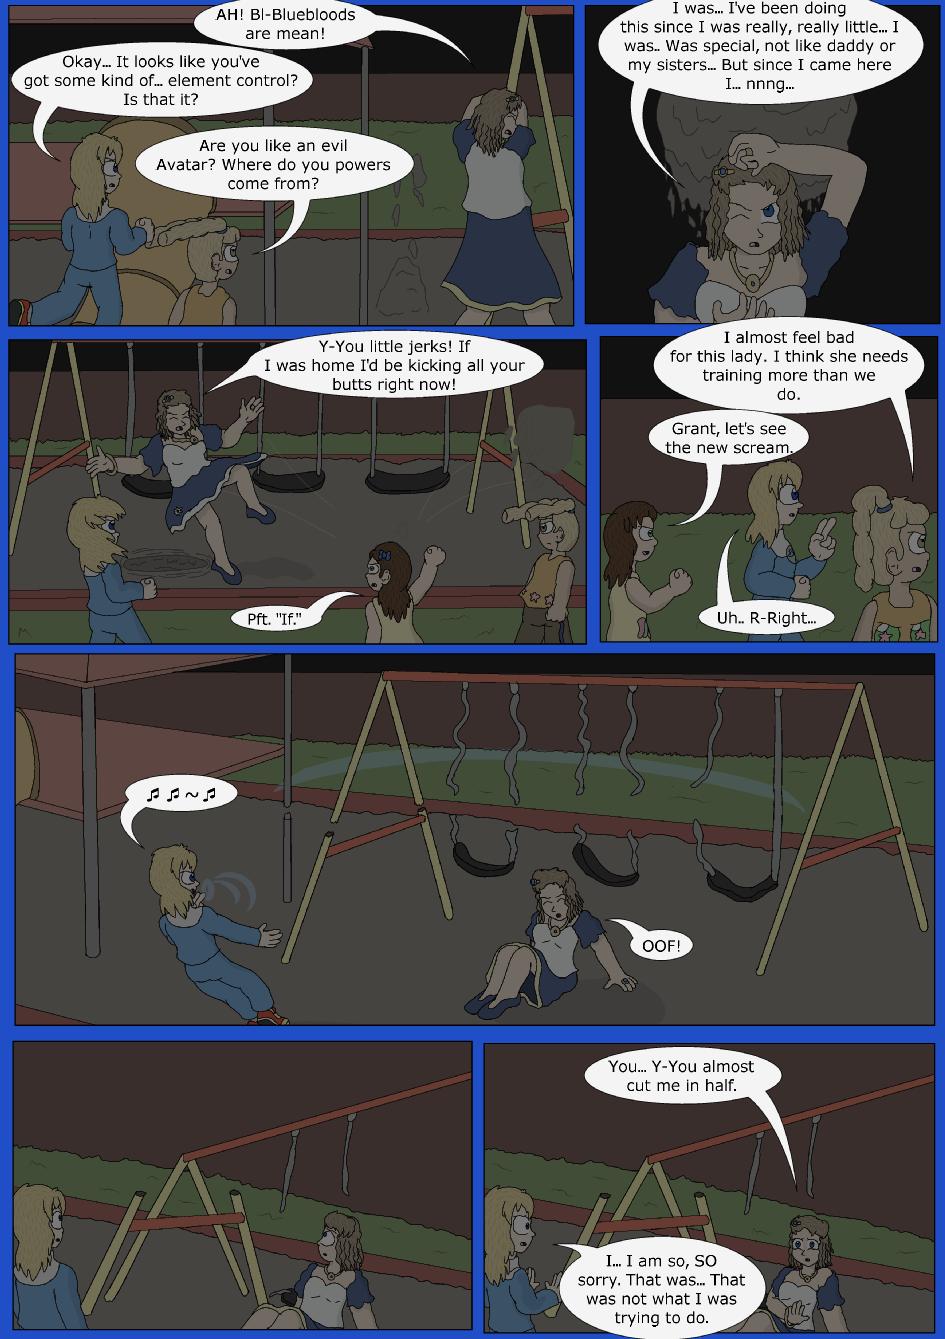 Stronger, Faster, Bluer, Page 18er